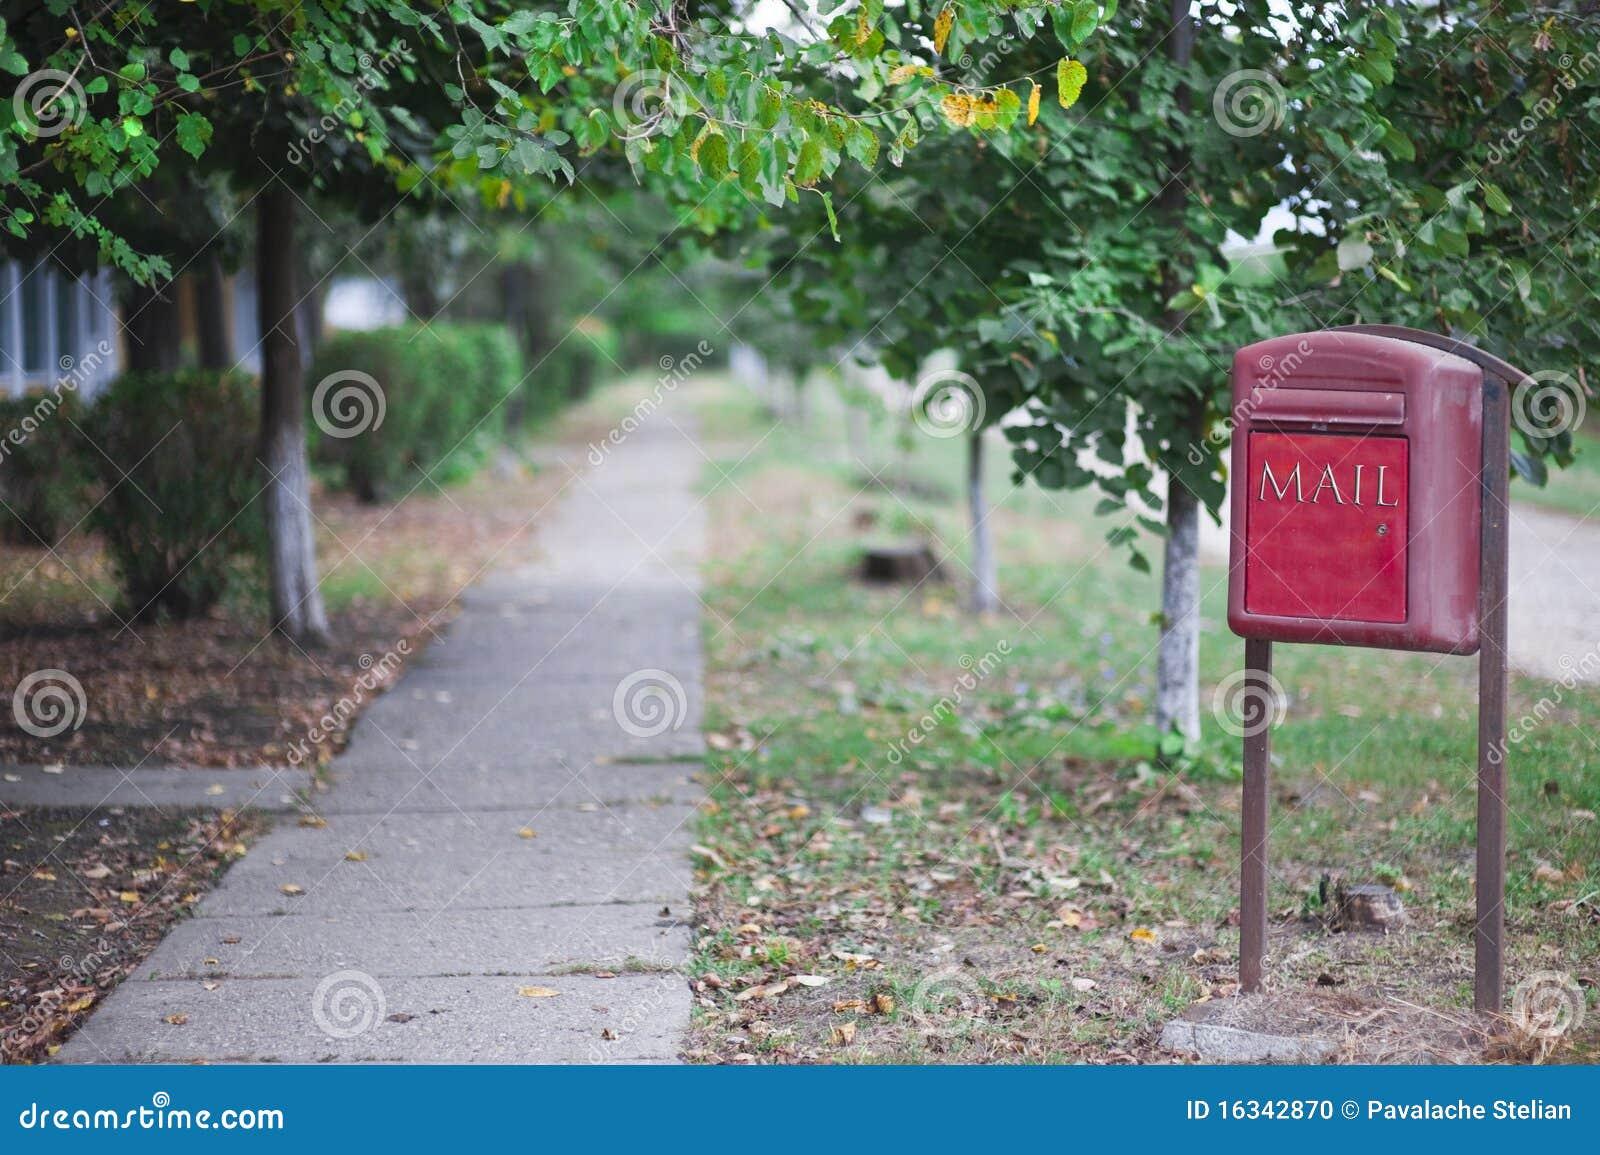 Rural mail post box